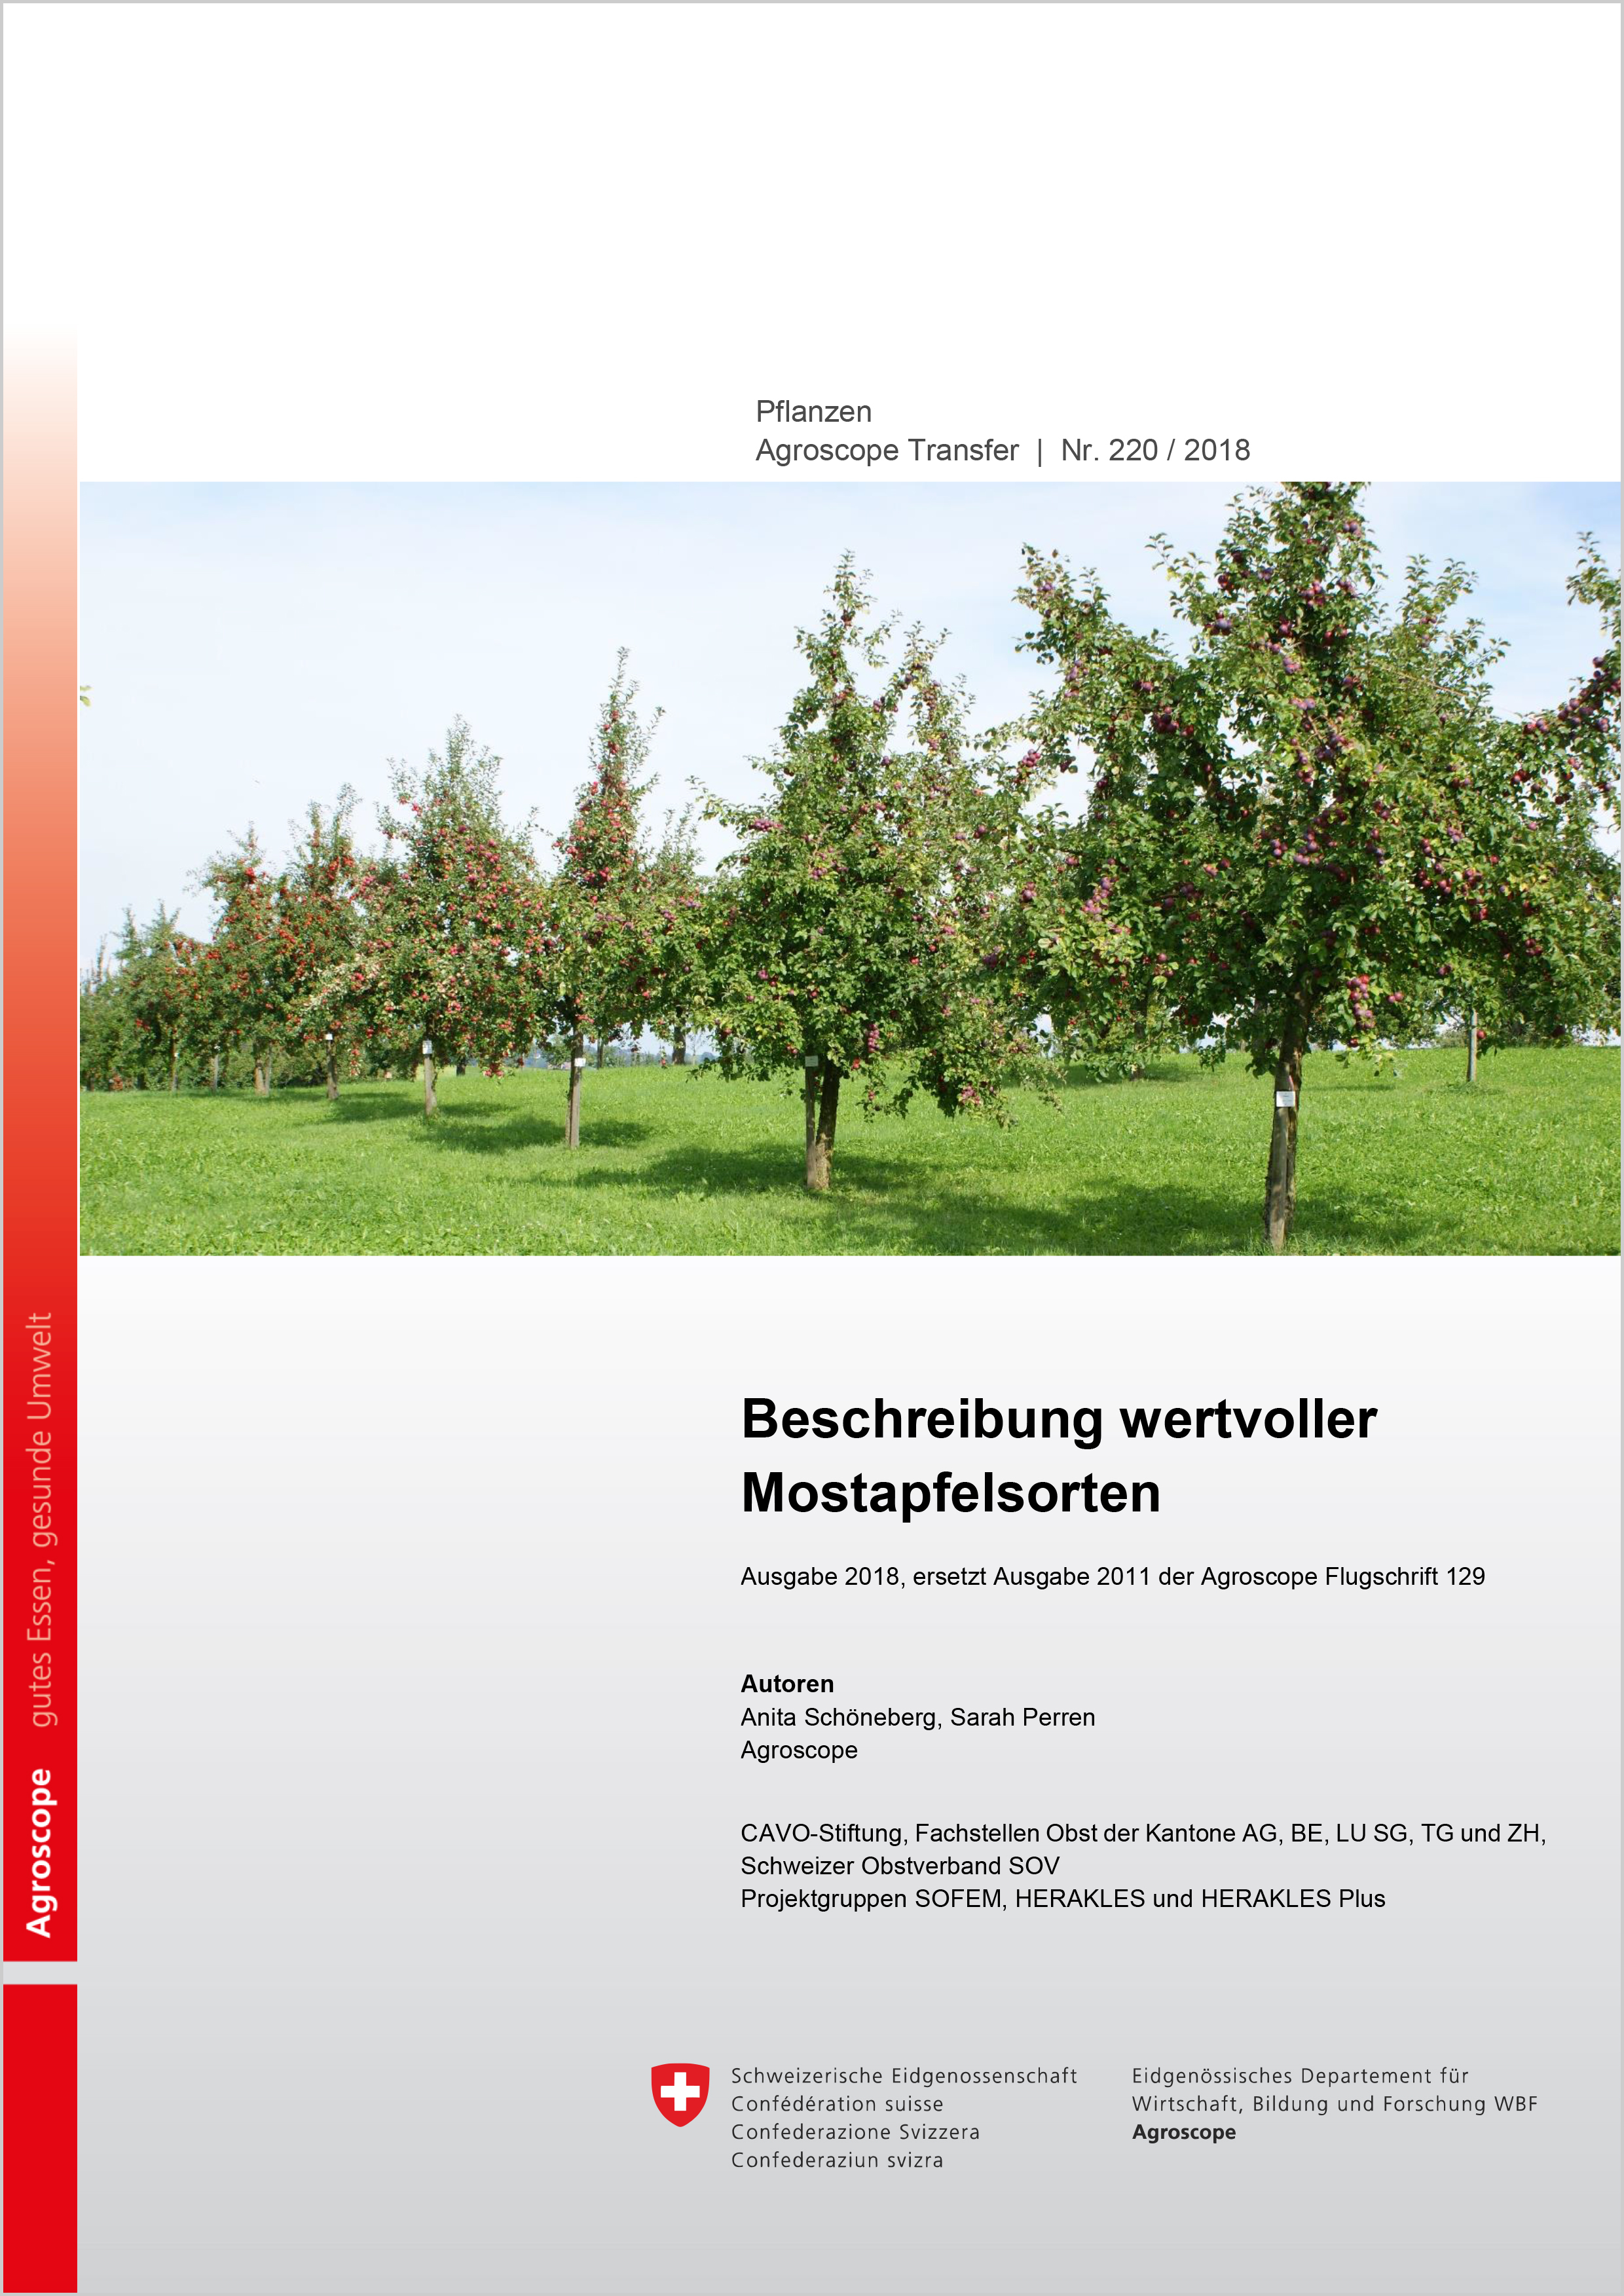 Beschreibung wertvoller Mostapfelsorten (Agroscope, 2018)